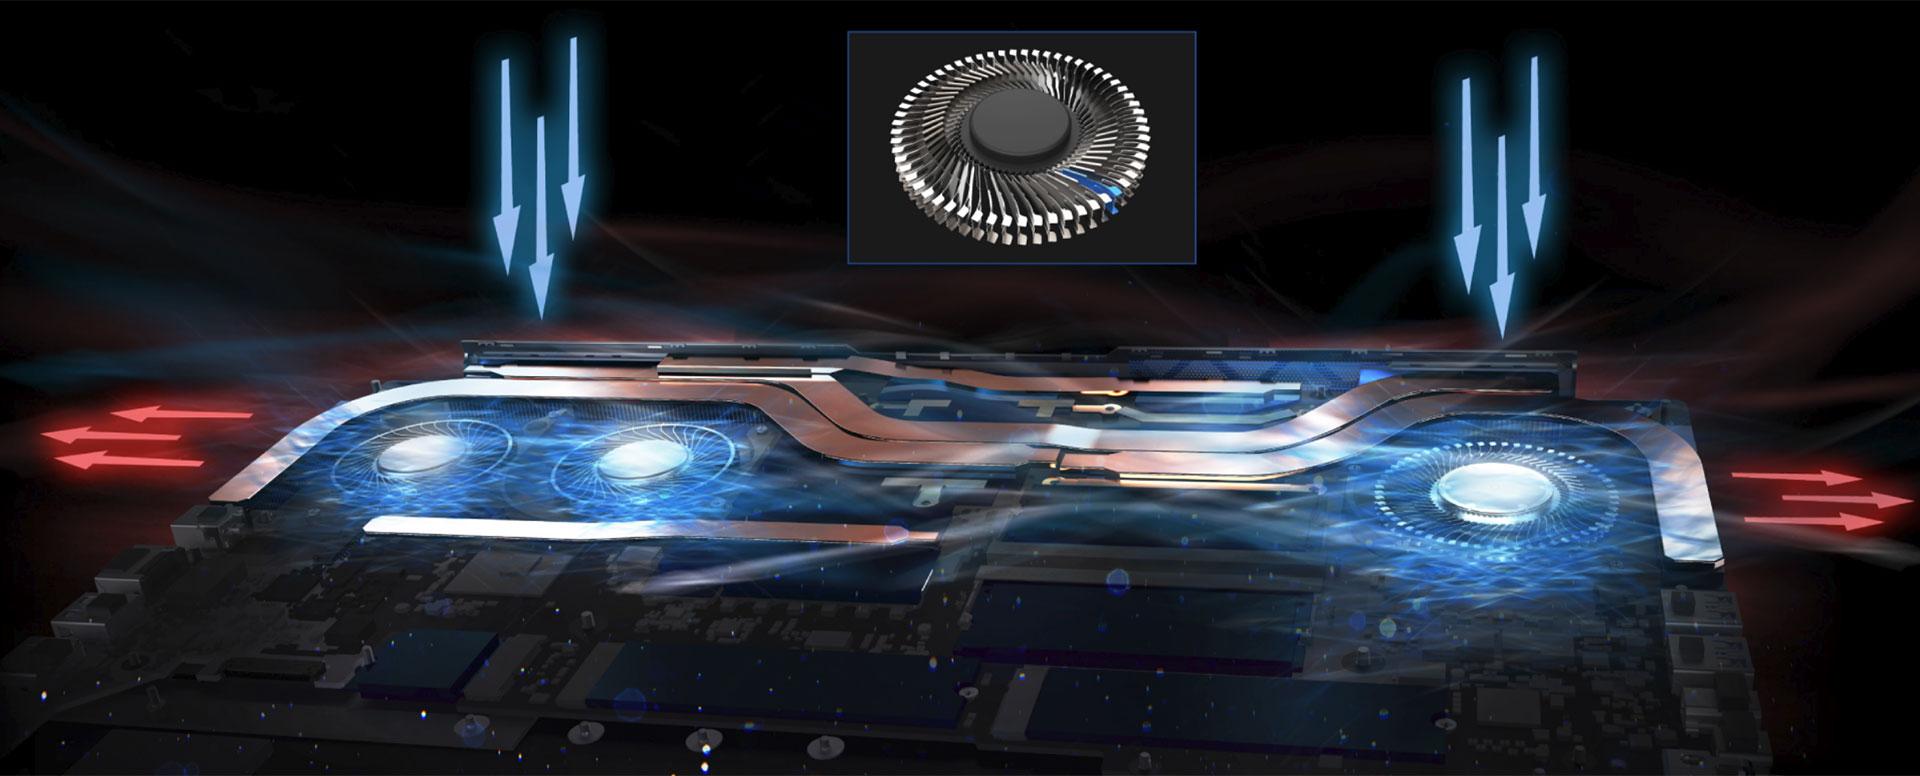 Acer Predator Triton 500 - cooling